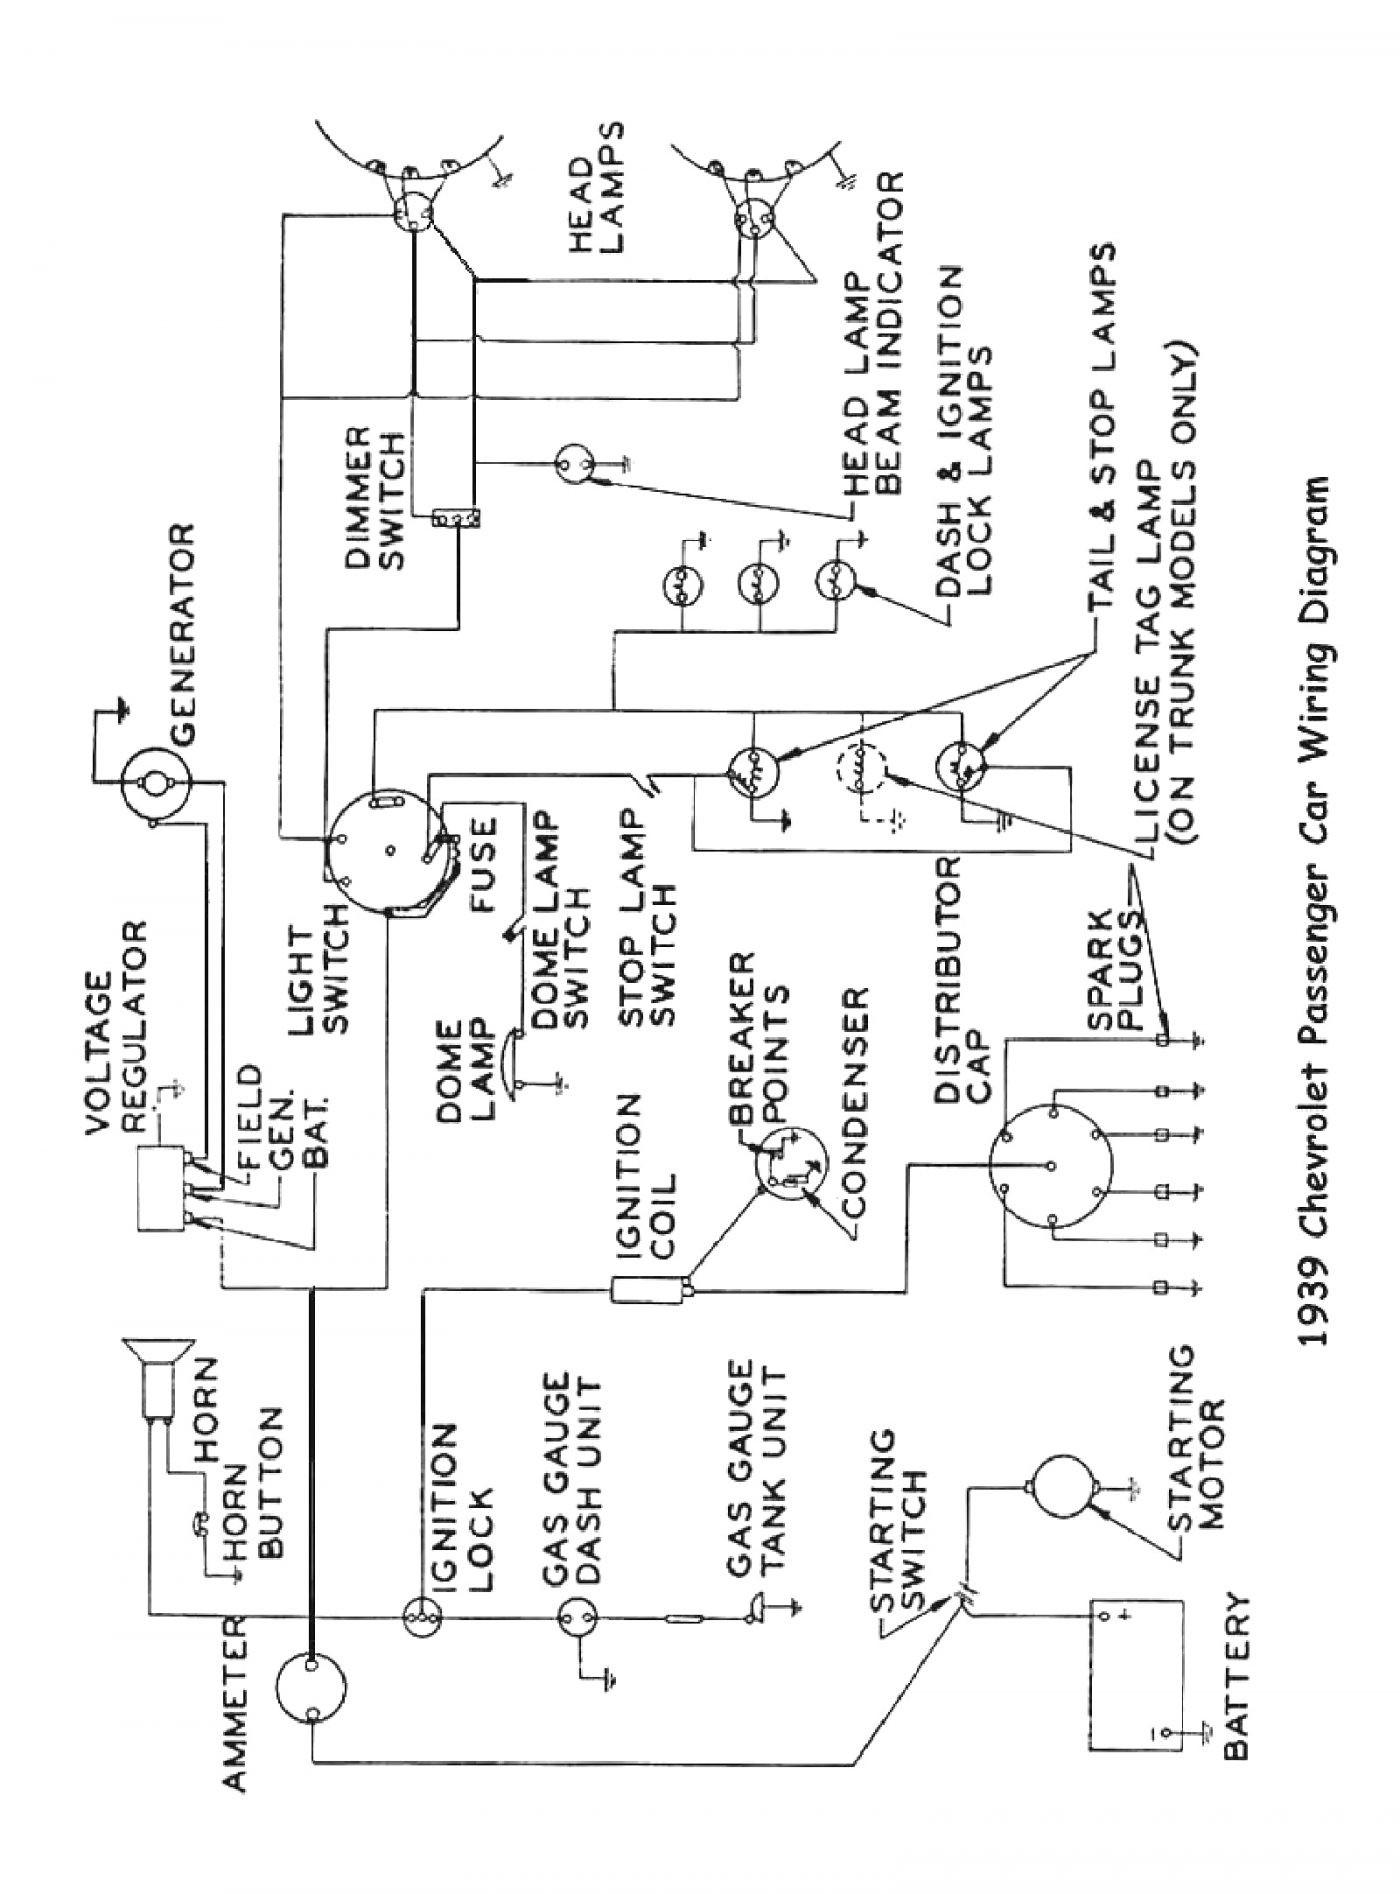 Meyer Plow Wiring Diagram Meyers Snow Plowiring Diagram Pump Meyer Control Switch Plow Wiring Of Meyer Plow Wiring Diagram